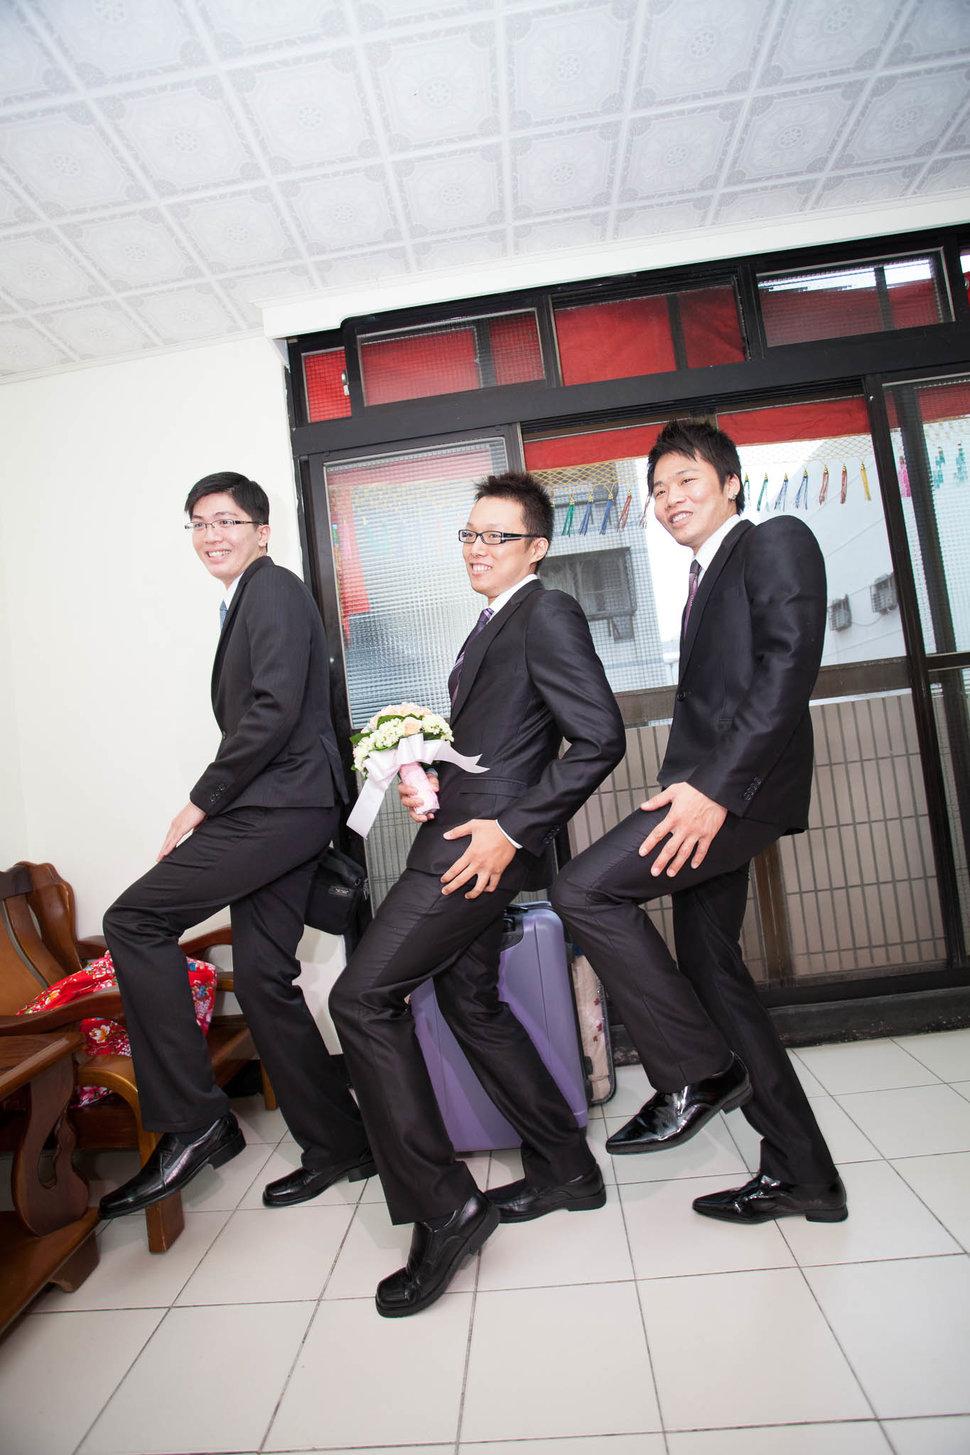 18PHOTO-青蛙王子娶新娘❤️(編號:218618) - 18PHOTO 婚紗影像攝影工作室 - 結婚吧一站式婚禮服務平台